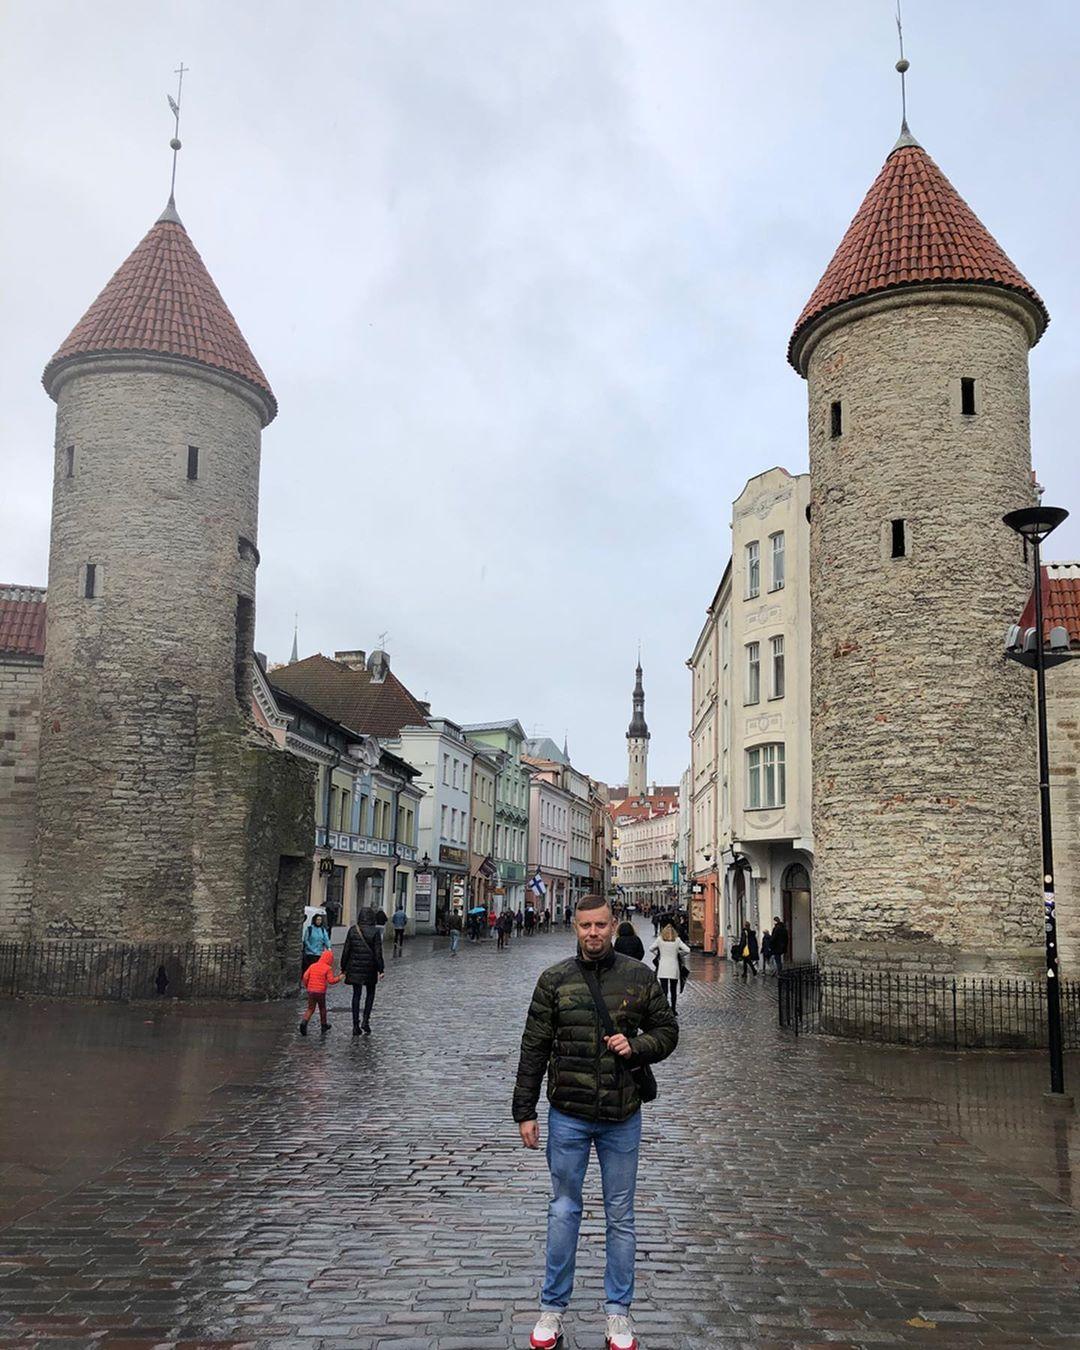 Tallinn Tallin Estland Estoniya Estonia Alexandernevskycathedral Kadriorupark Domberg Castrumdanorum Travel Reise Rei Reisen Estland Altstadt